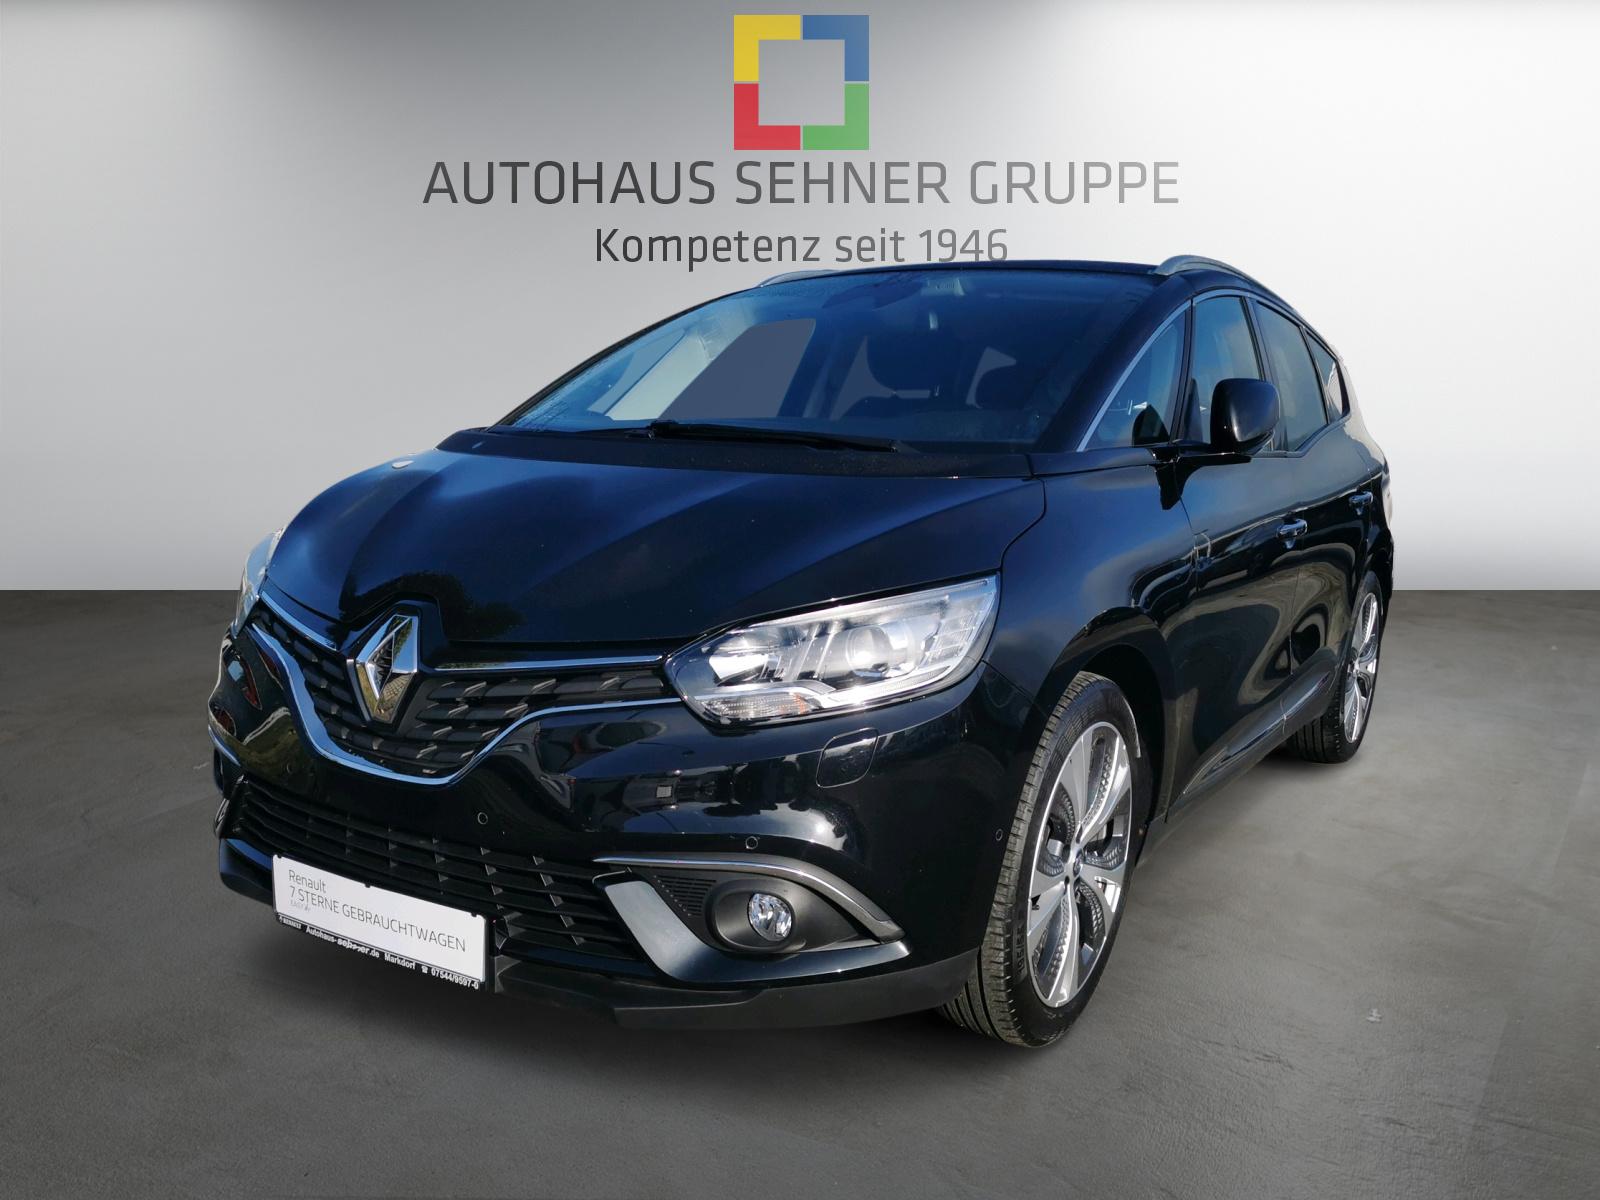 Renault Grand Scenic Intens ENERGY dCi 110 Hybrid Assist, Jahr 2017, Diesel